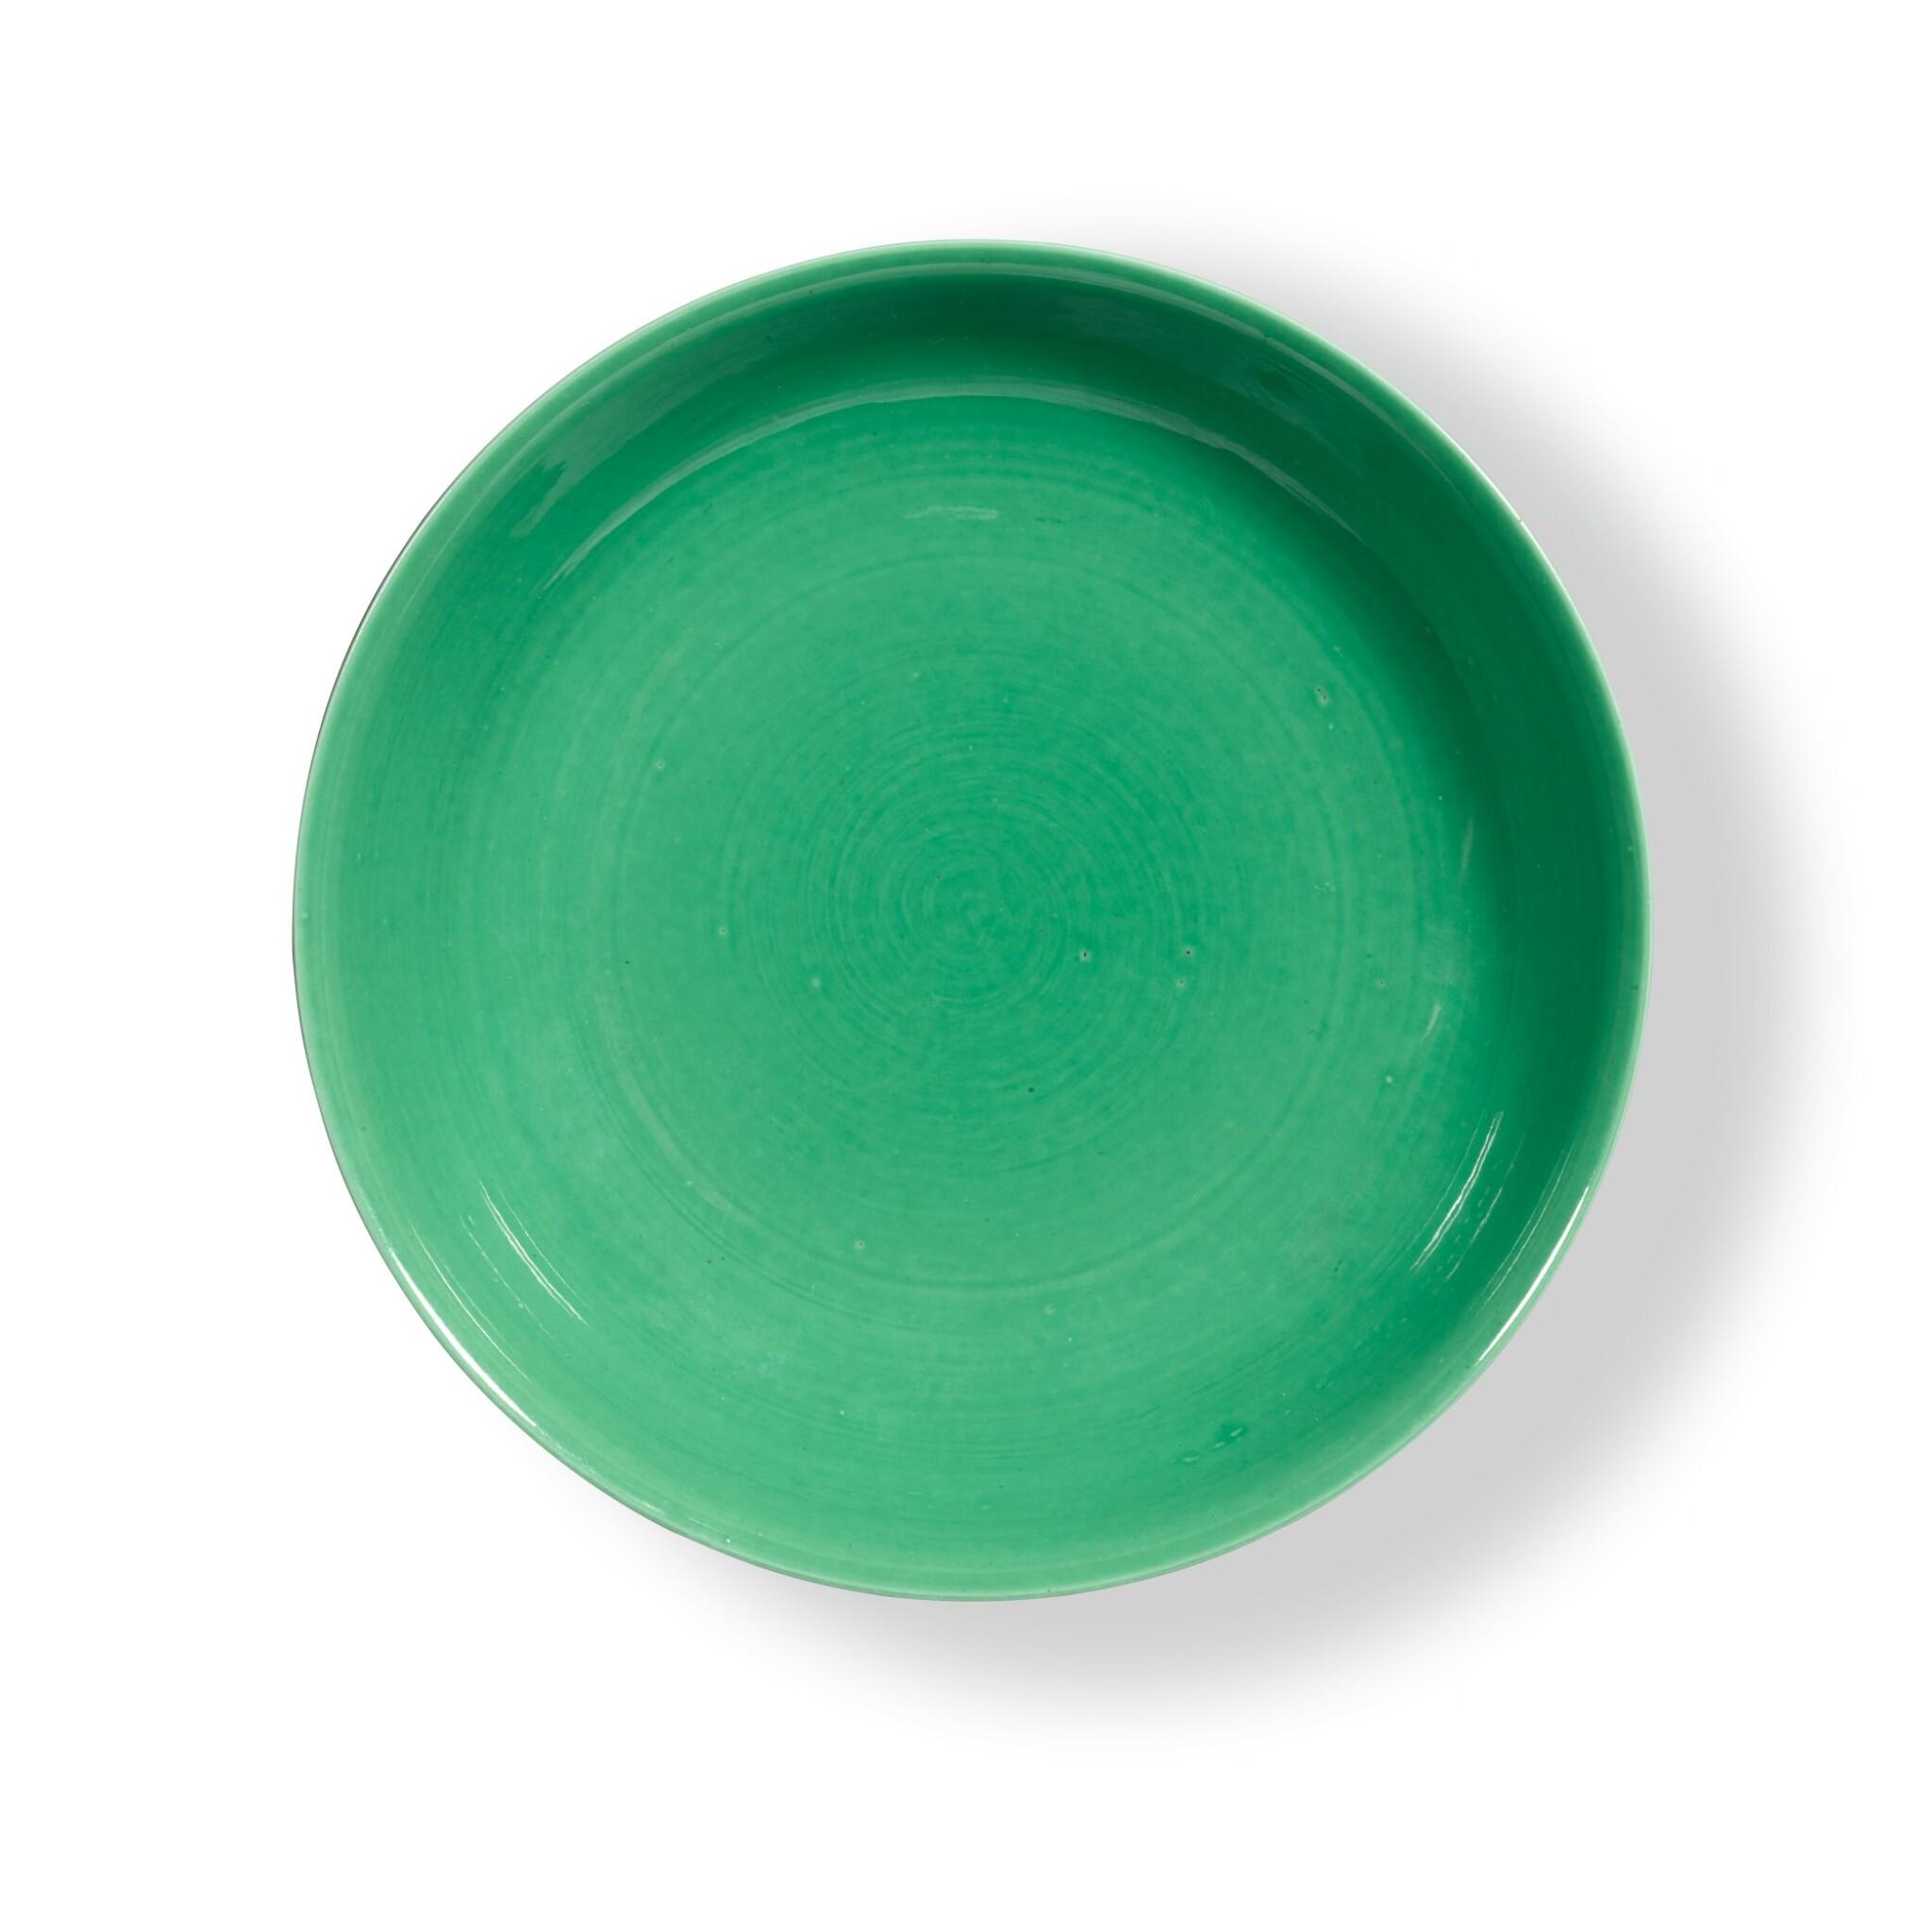 View full screen - View 1 of Lot 19. A RARE GREEN-GLAZED SAUCER DISH,  QIANLONG INCISED MARK AND PERIOD | 清乾隆 蘋果綠釉盤 《大清乾隆年製》款.